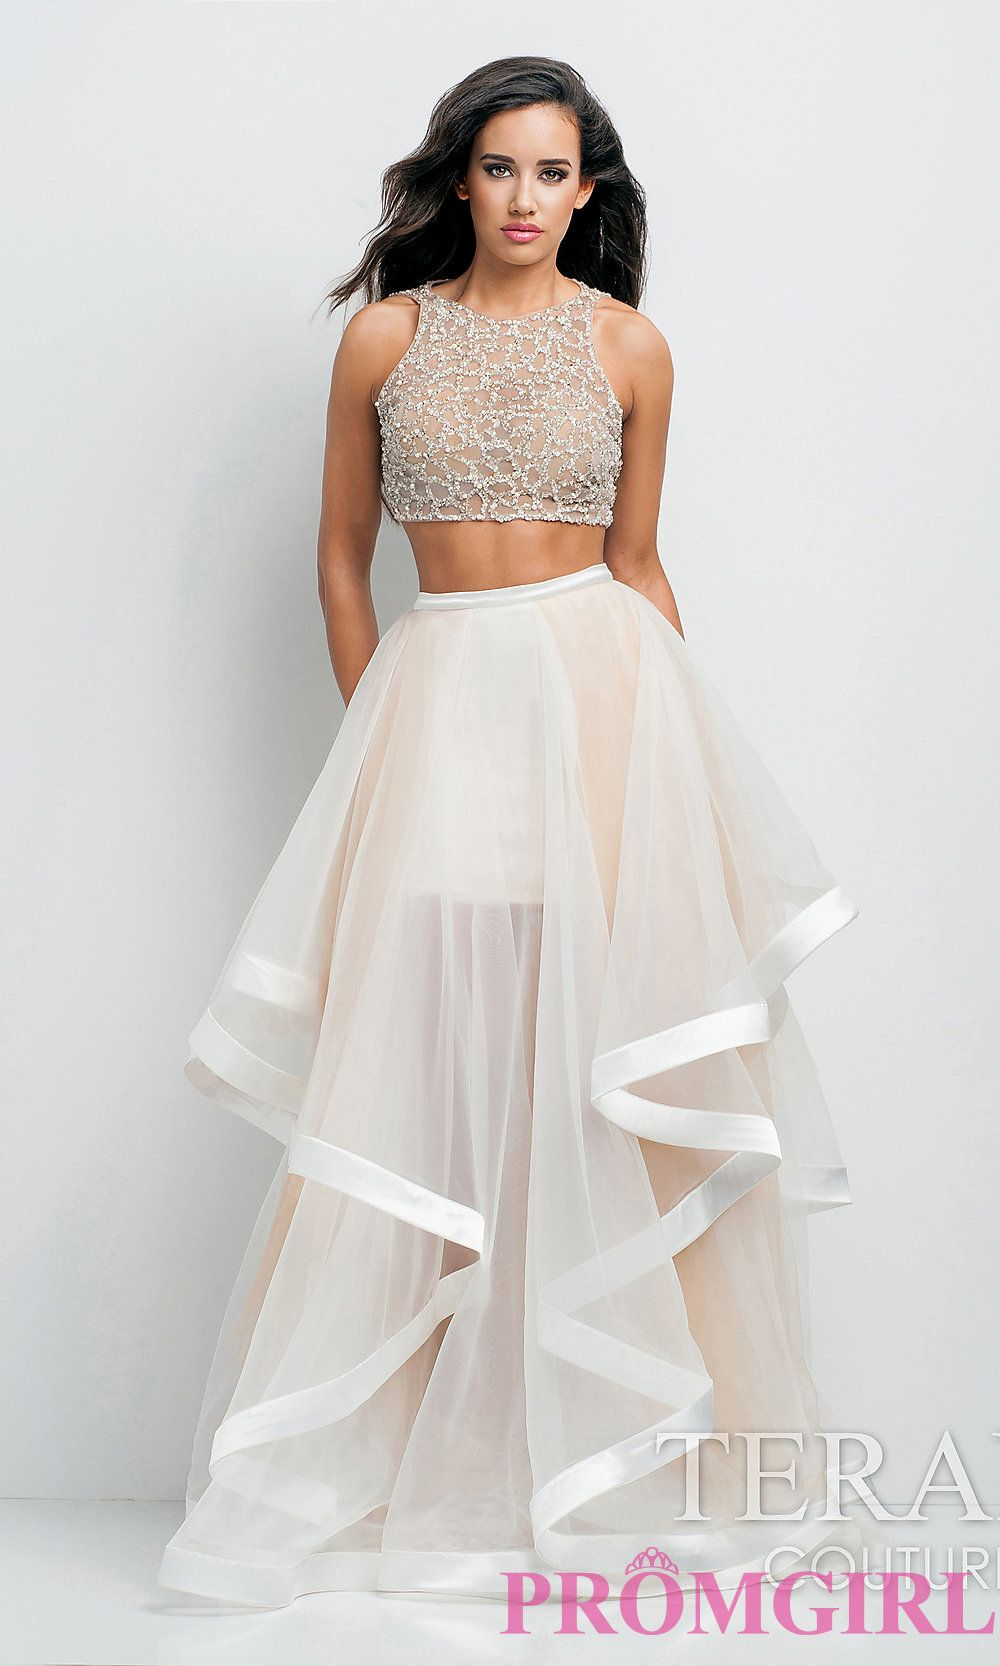 Terani Prom Dresses 2015